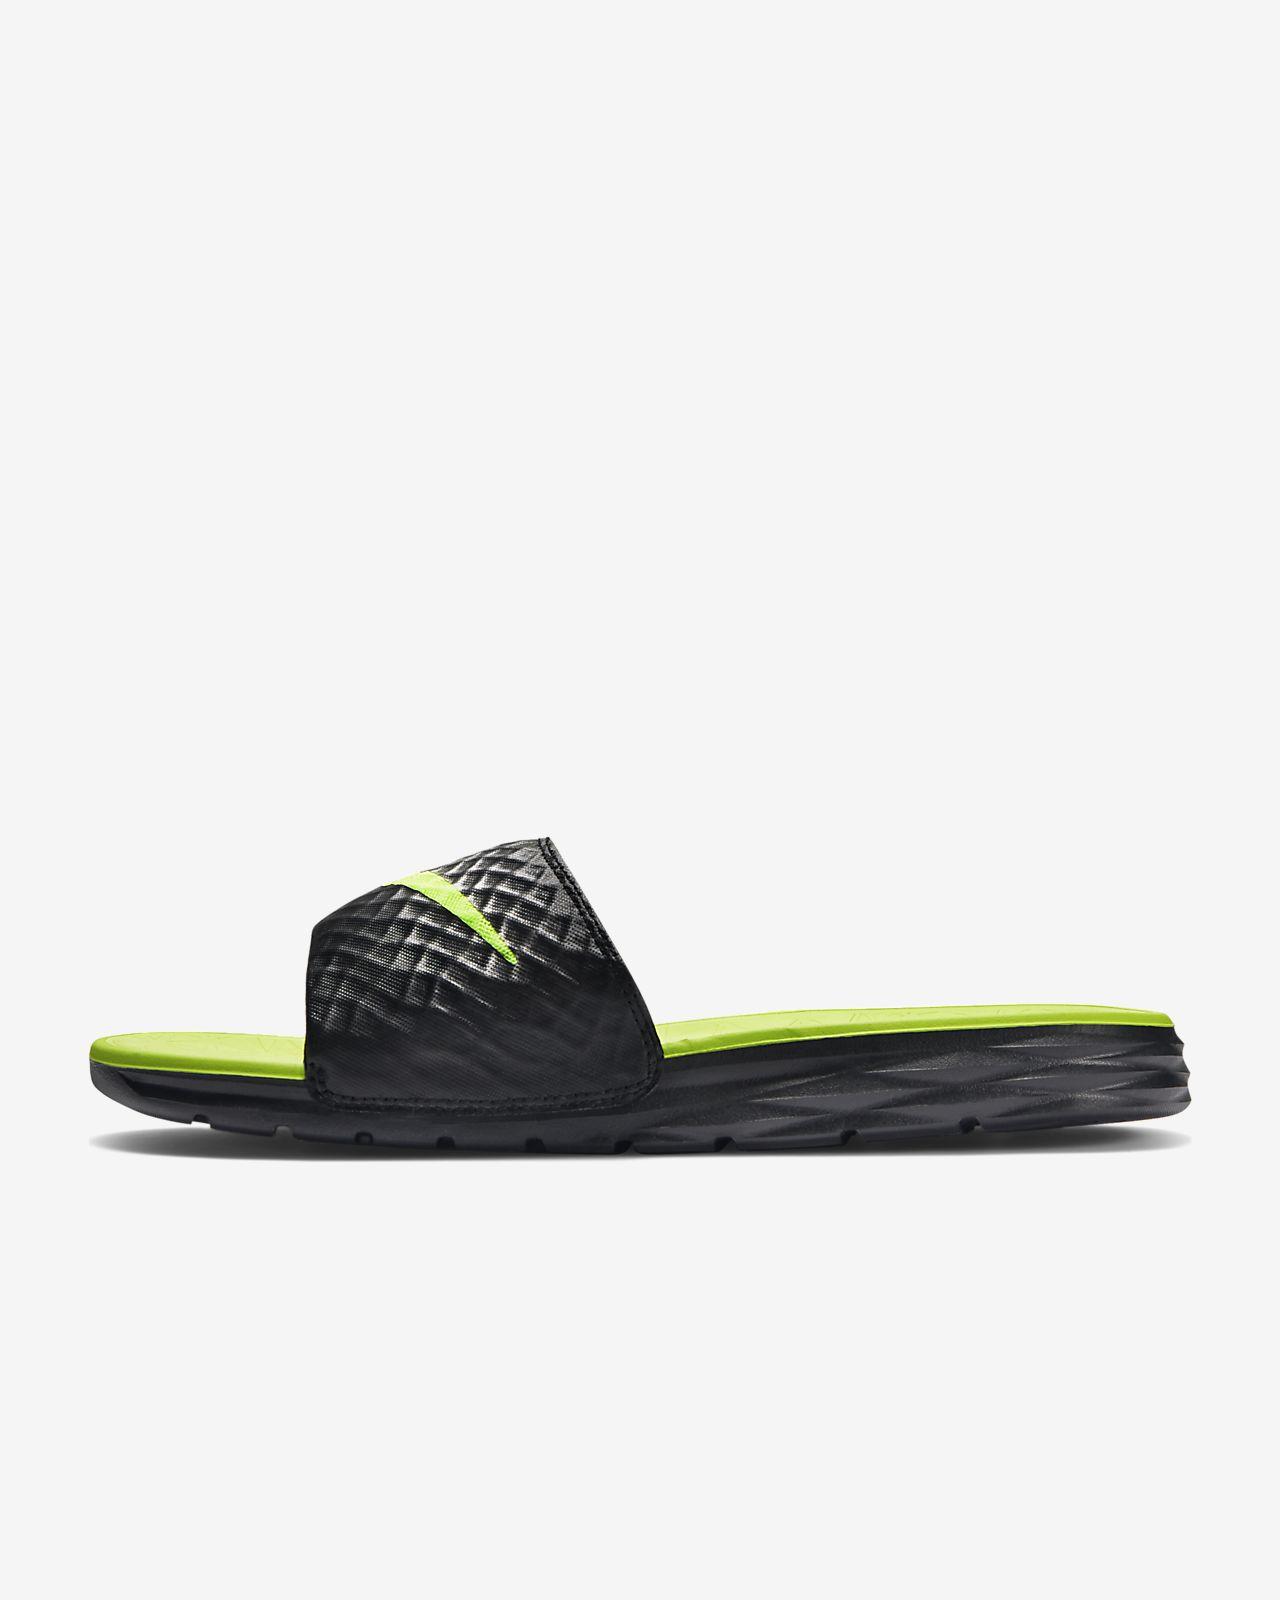 14f66bf78e0b Nike Benassi Solarsoft 2 Men s Slide. Nike.com